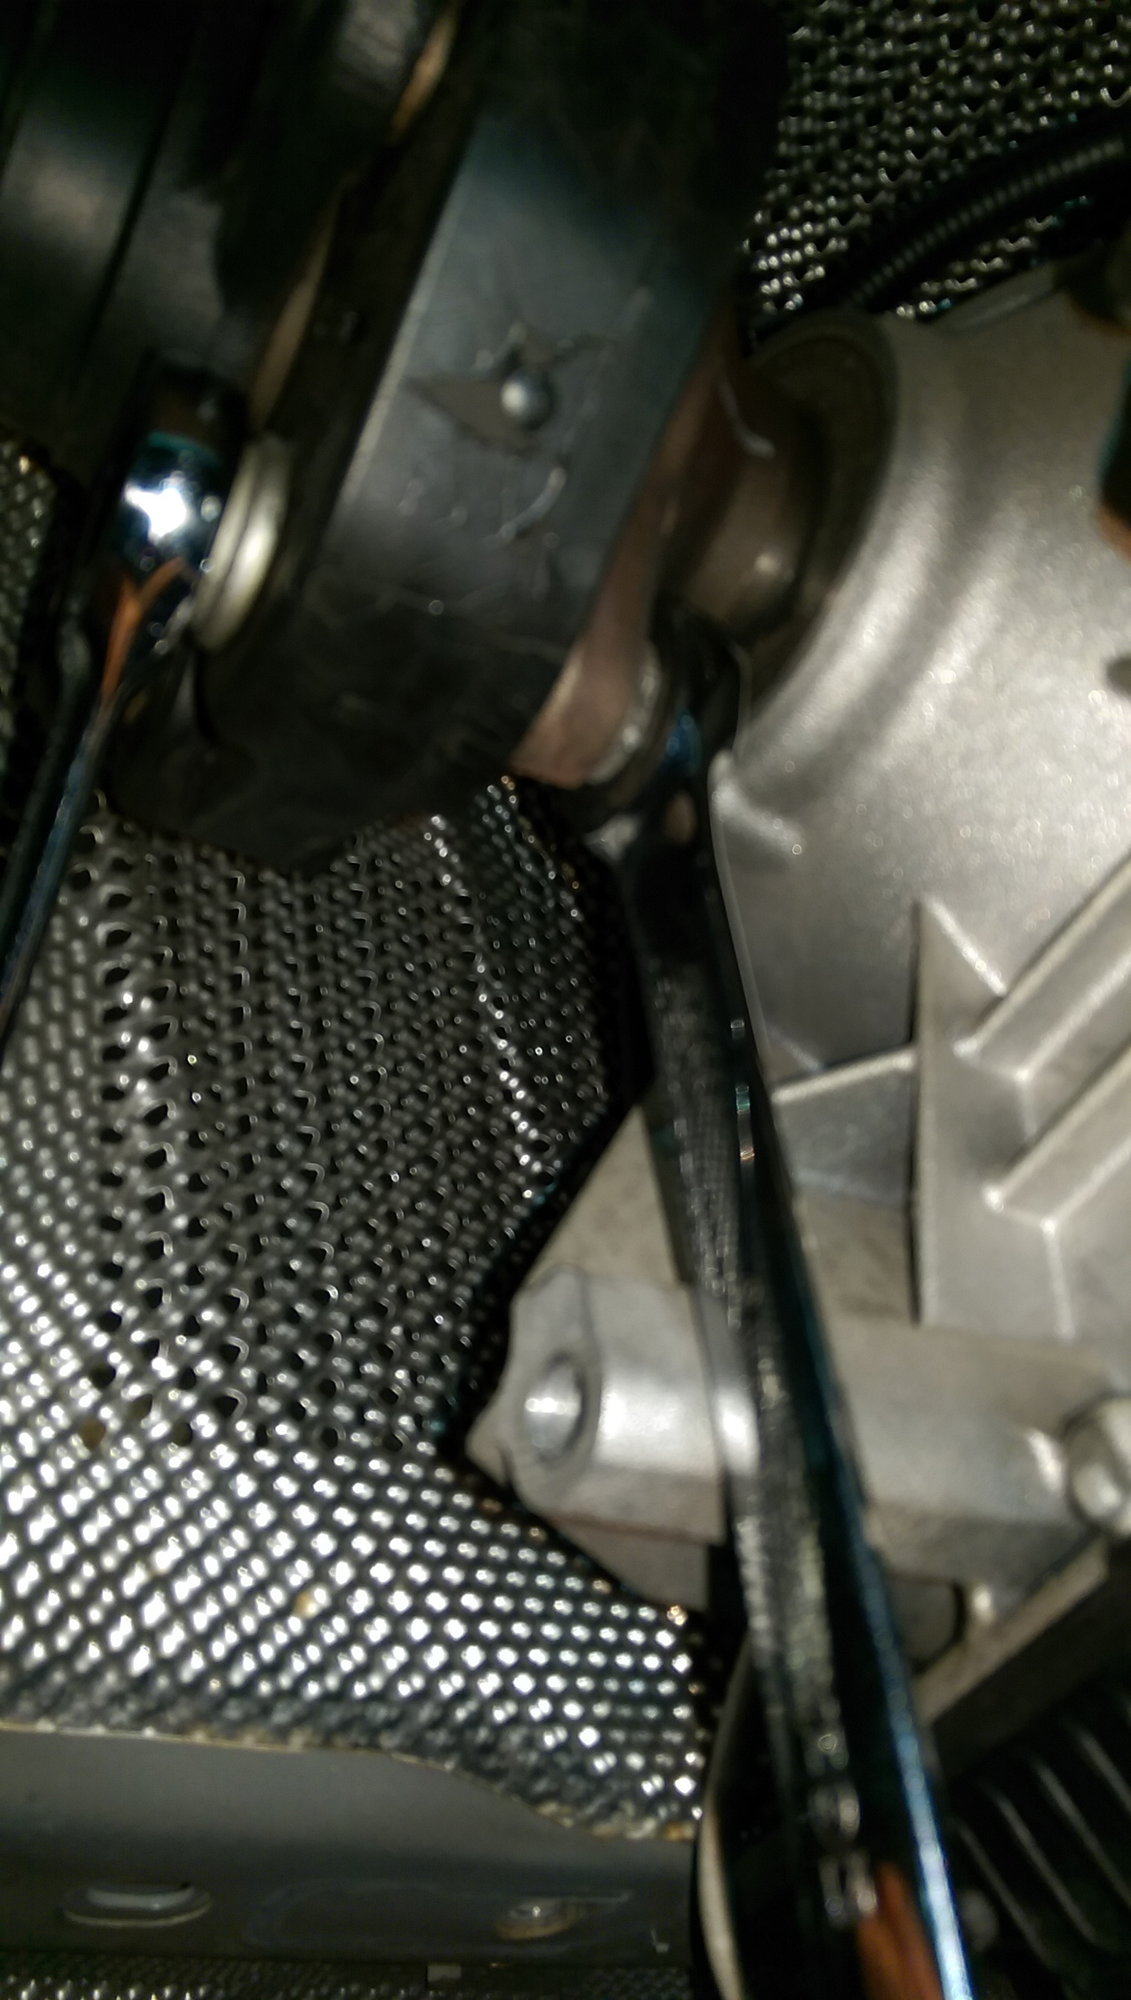 E46 Half Shaft Removal